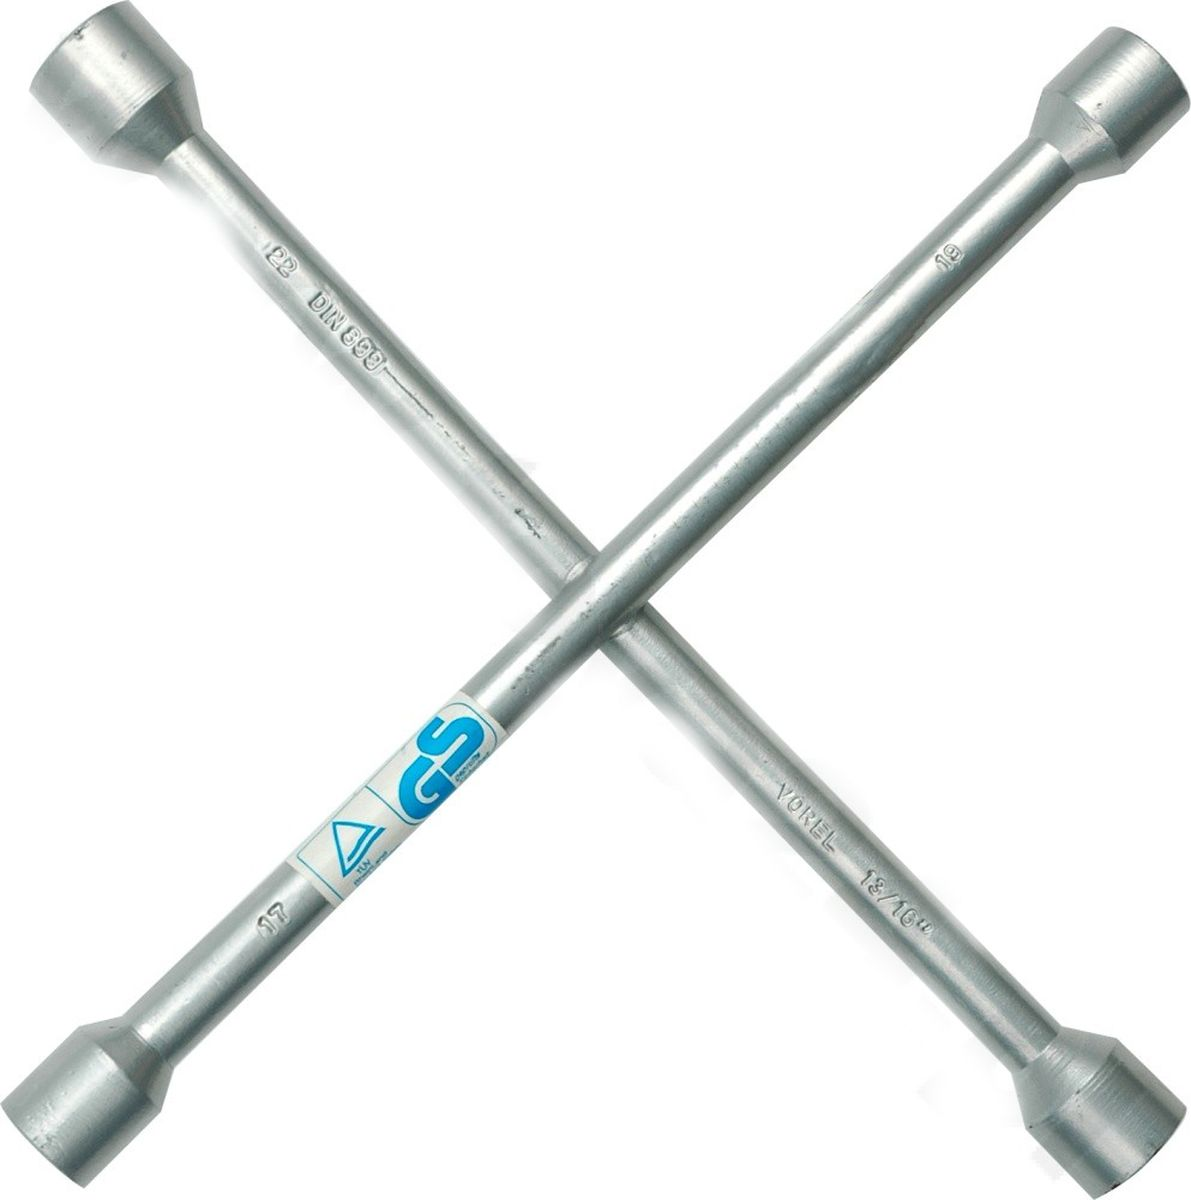 Ключ балонный Vorel, крест 17x19x22x13/16CA-3505Ключ балонный VOREL крестовой, размер 17x19x22x13/16.